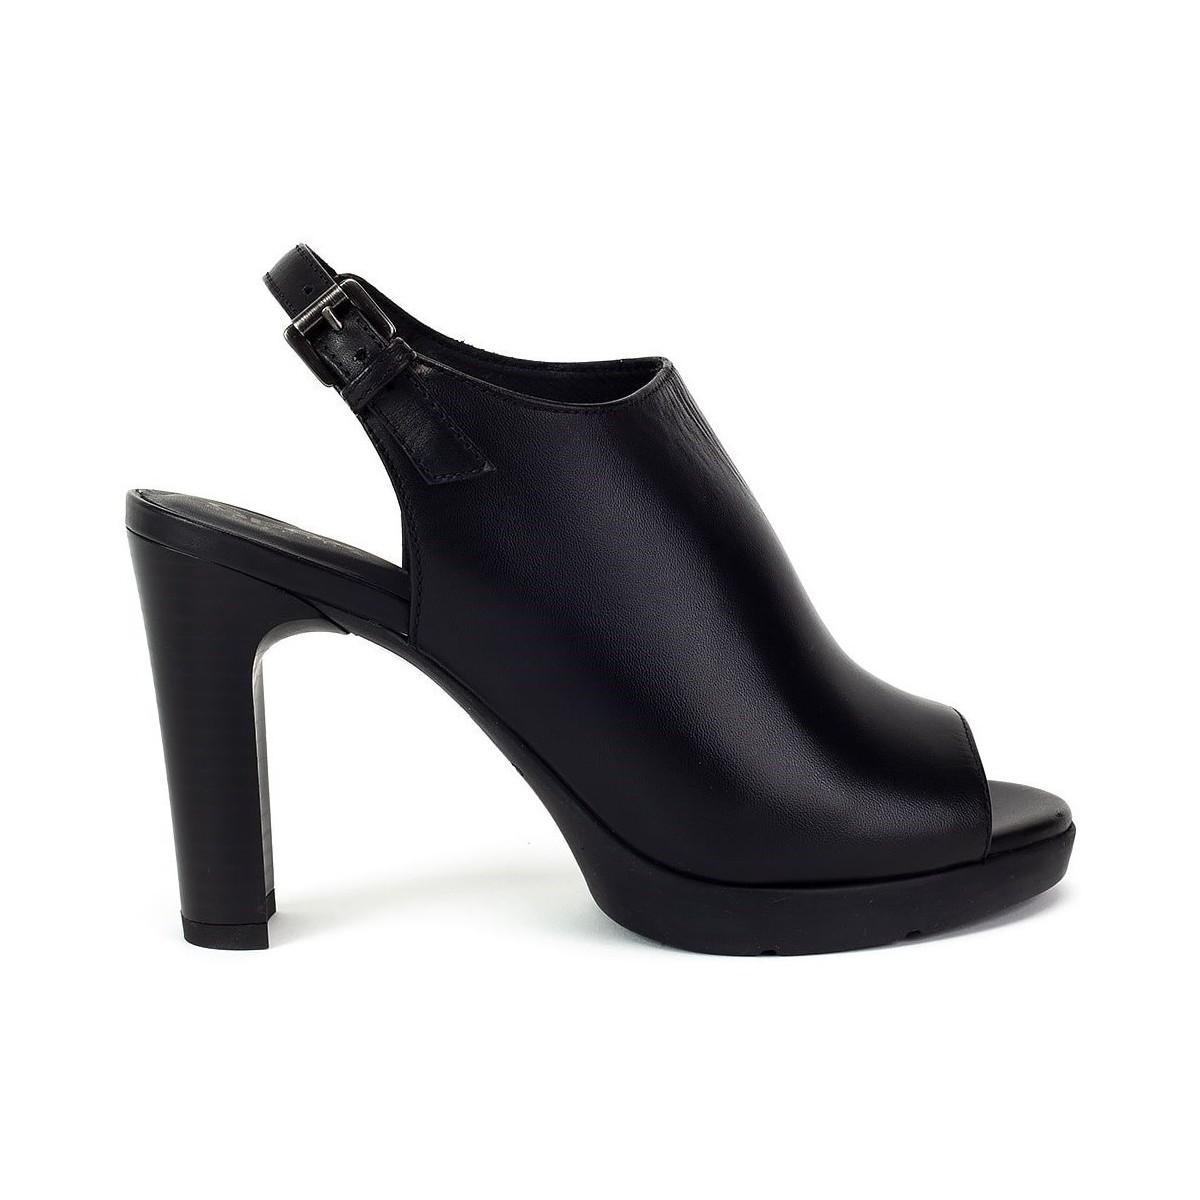 Geox Annya Women's Sandals In Black in Black Lyst